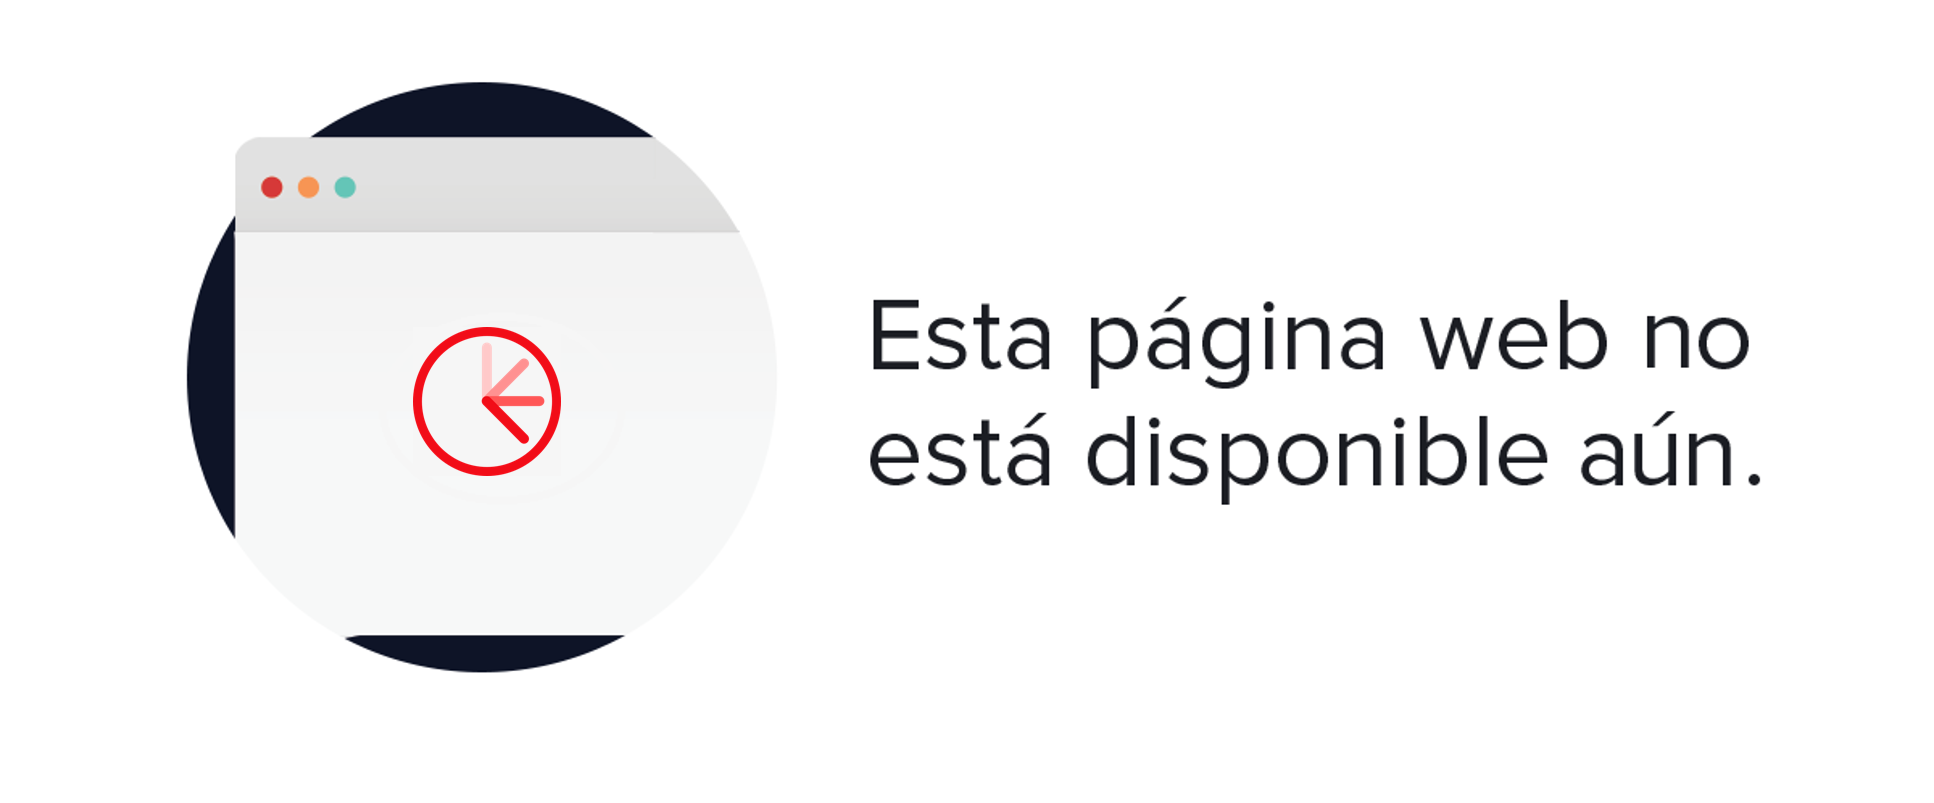 Polo Ralph Lauren - Falda de seda de mujer Polo Ralph Lauren con flores Granate 001014962292323002 - RNZECRH